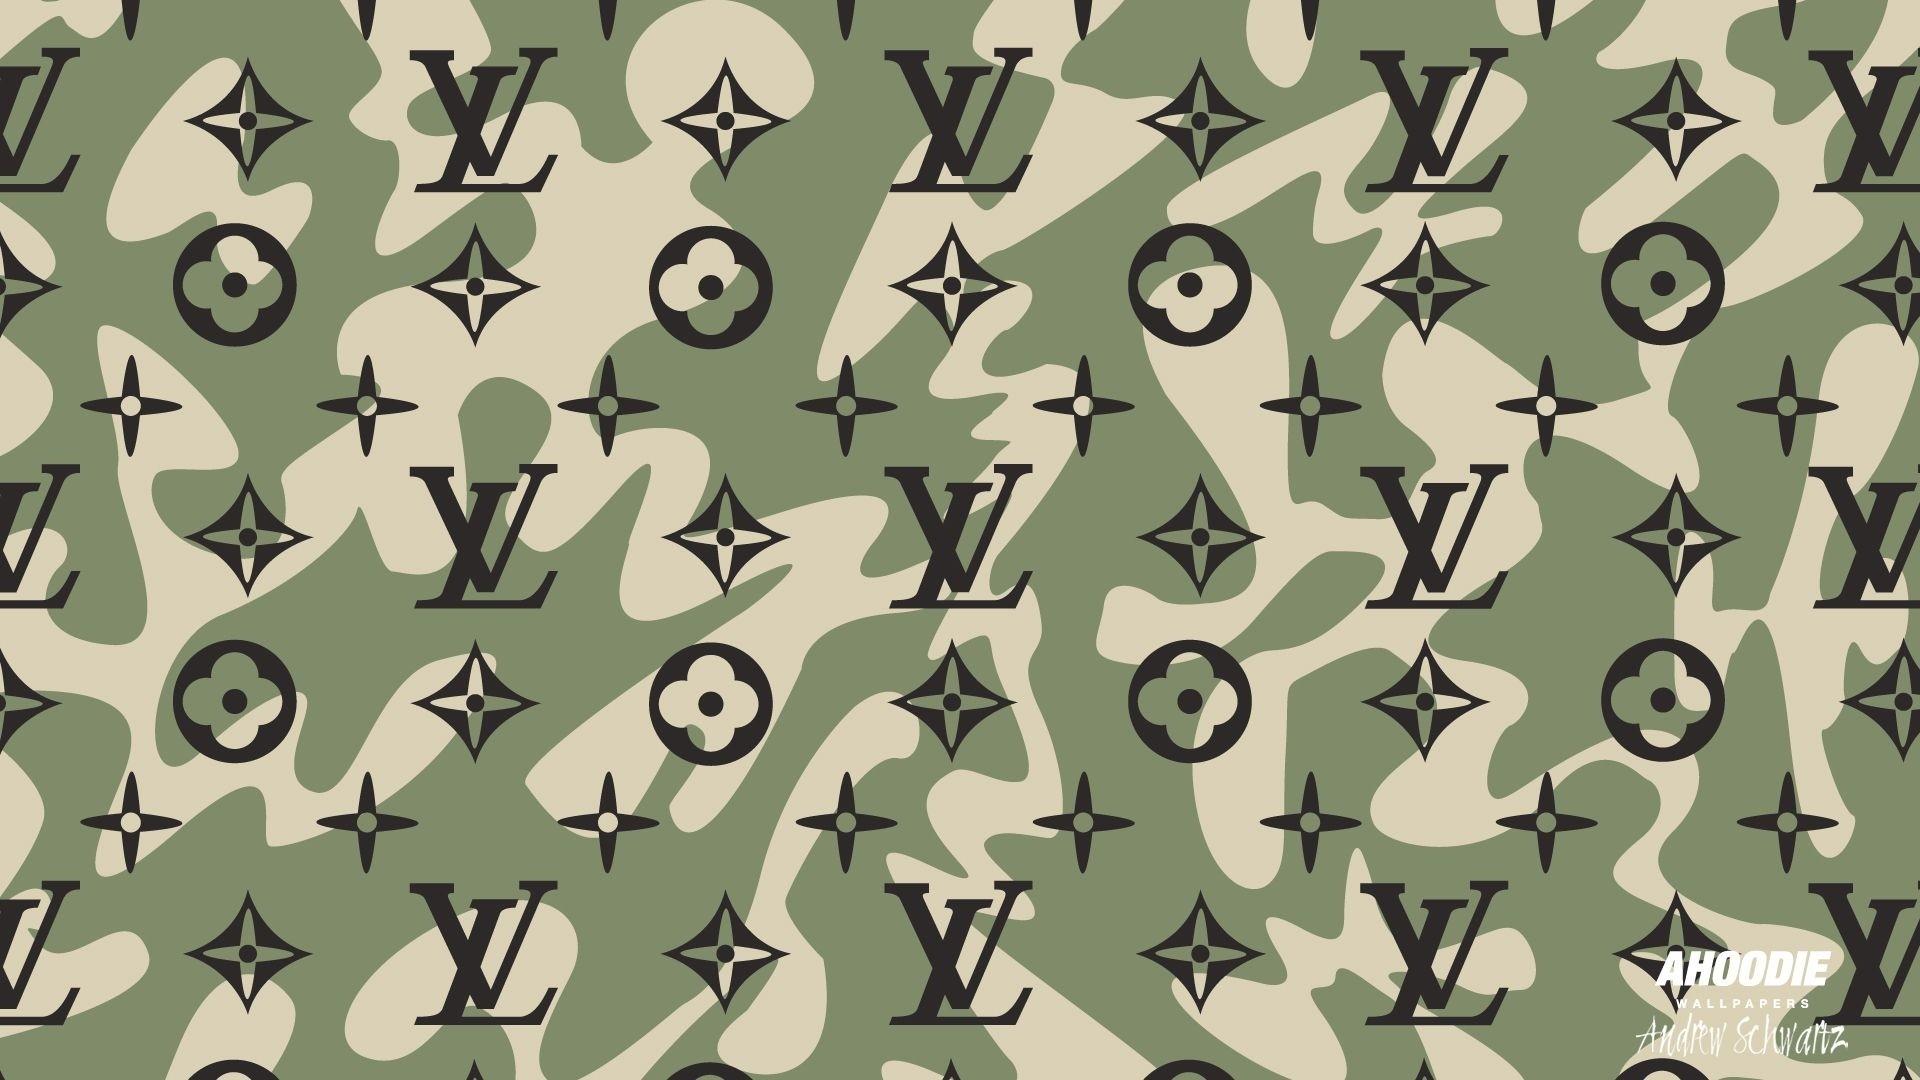 Bape camouflage wallpaper photo new bape camo logo – Bape Iphone Wallpaper  Louis Vuitton Wallpapers Wallpaper